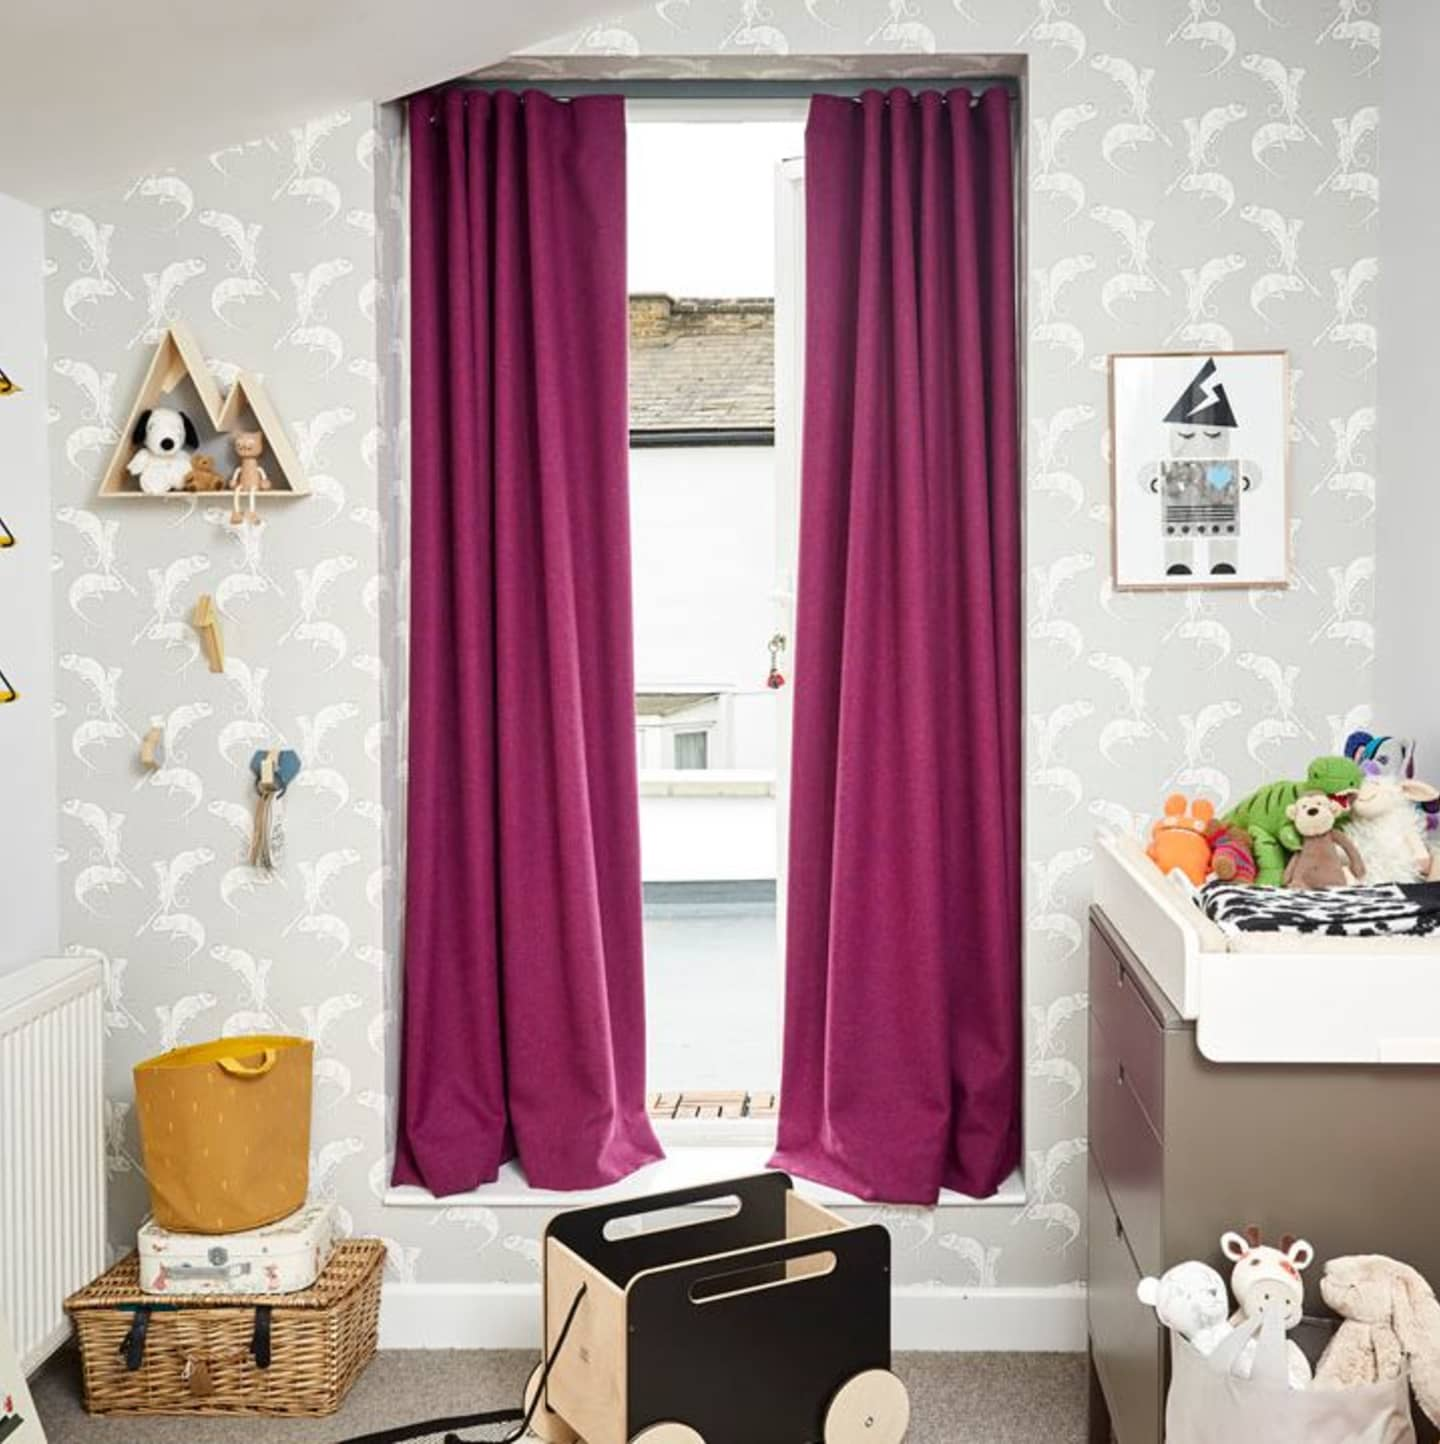 purple curtains in nursery